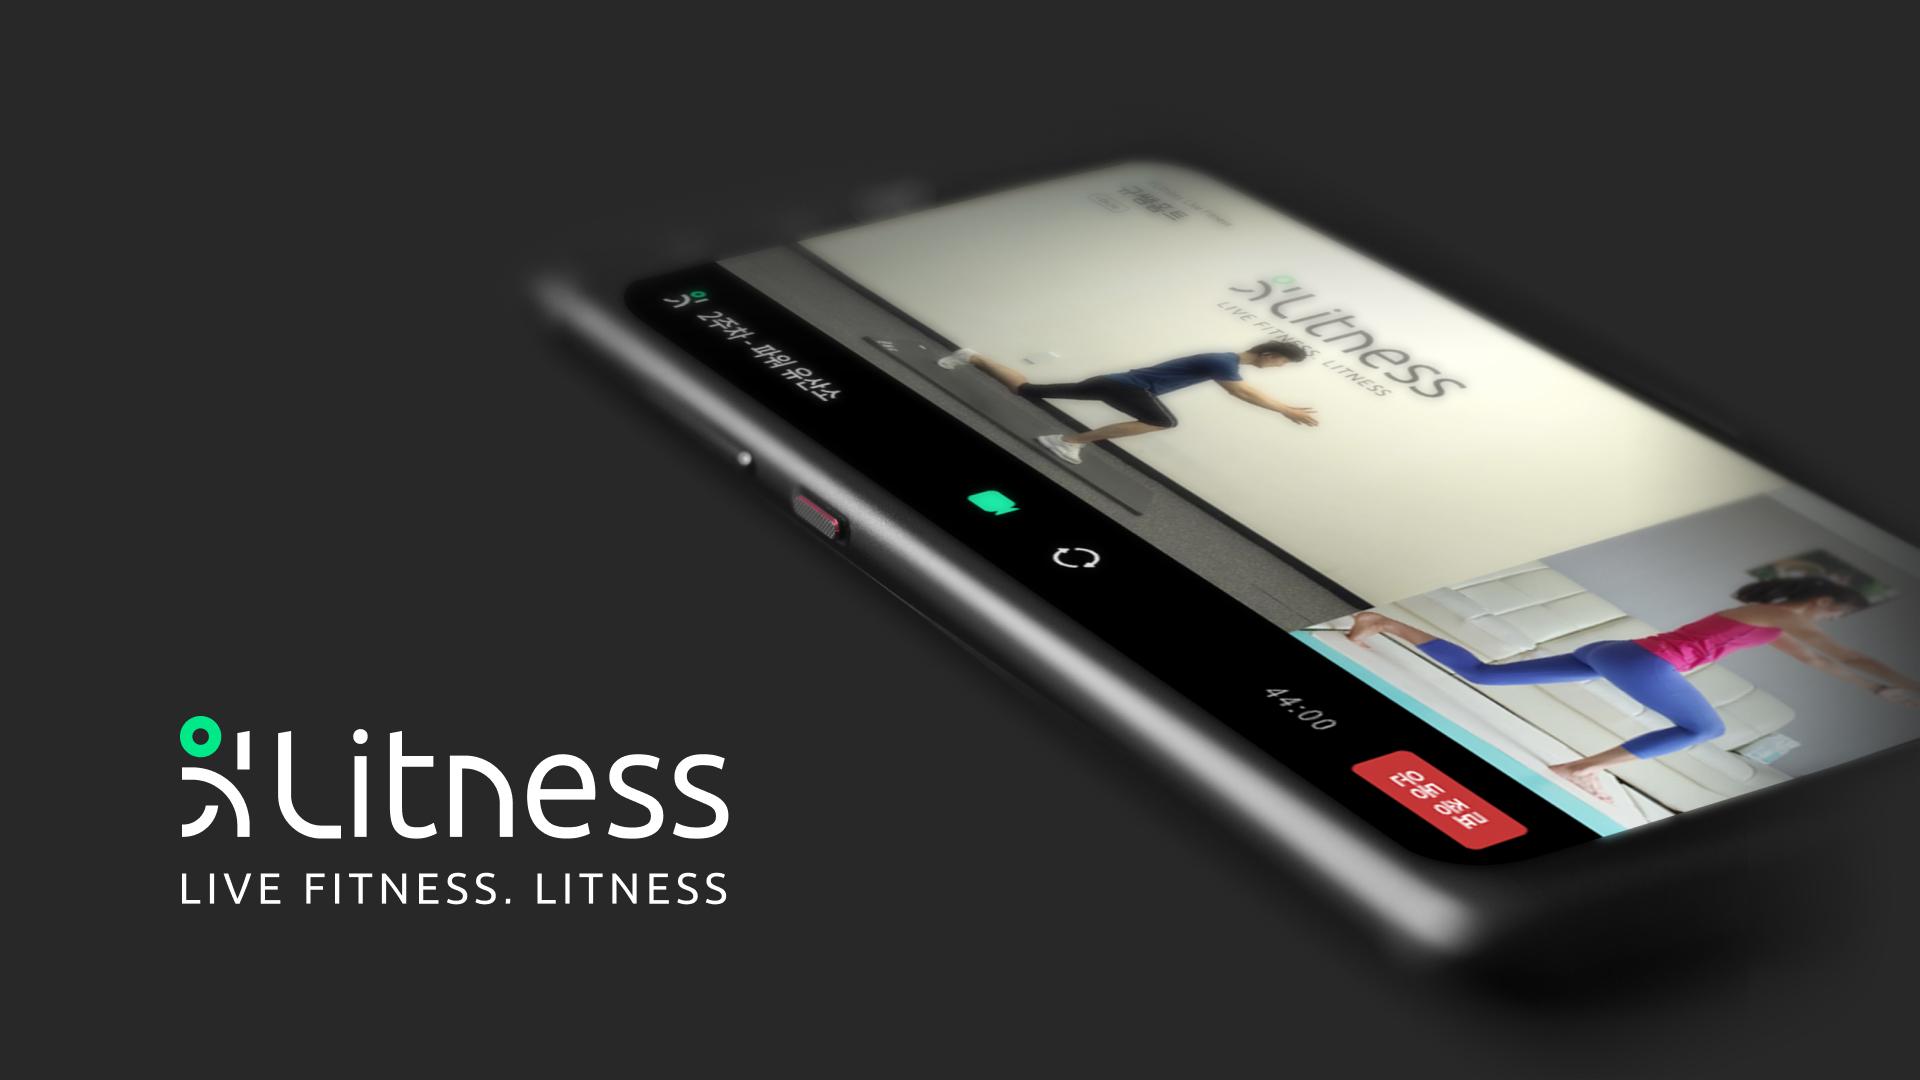 Litness LIVE FITNESS. LITNESS 앱 화면